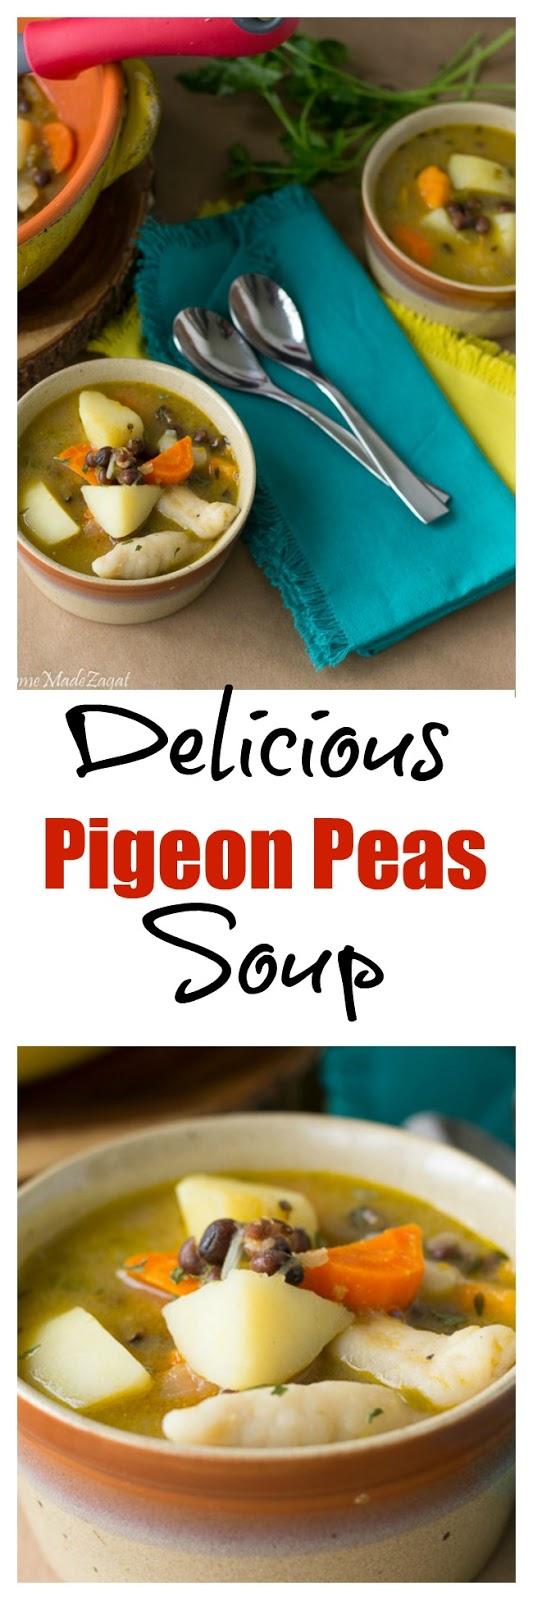 Pigeon Peas Soup